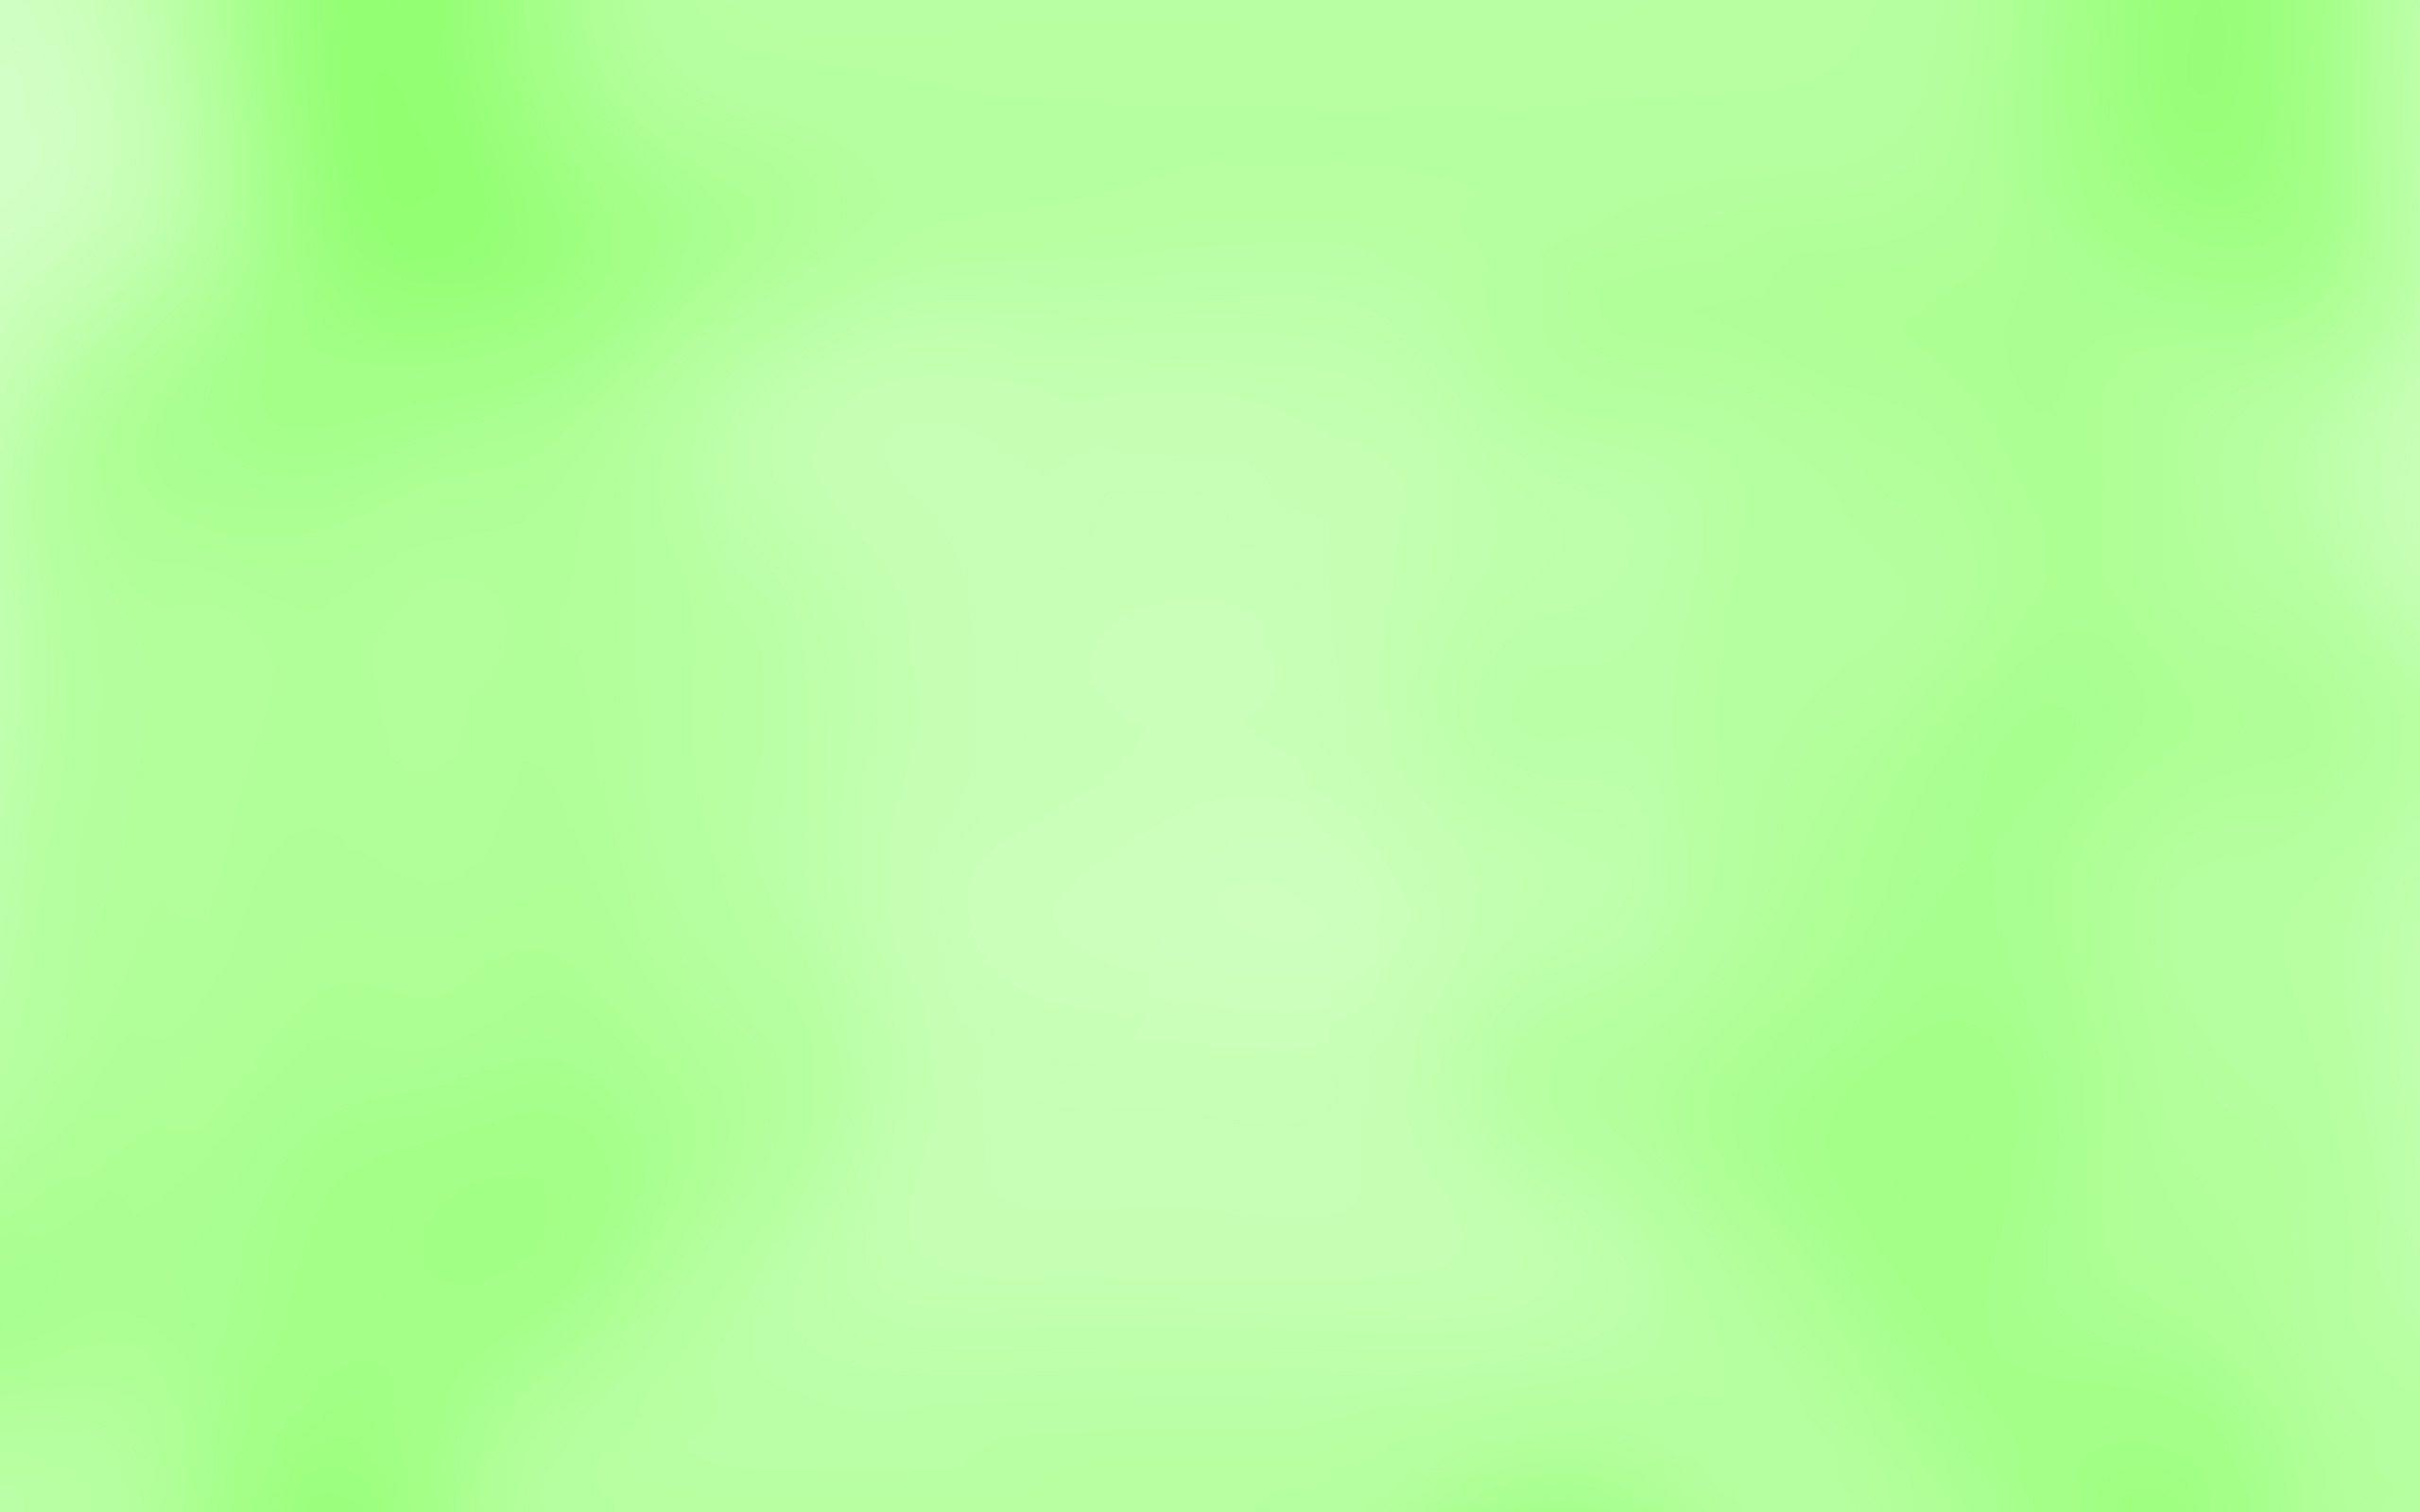 Light Green Hd Background Wallpaper Basic Background 2560x1600